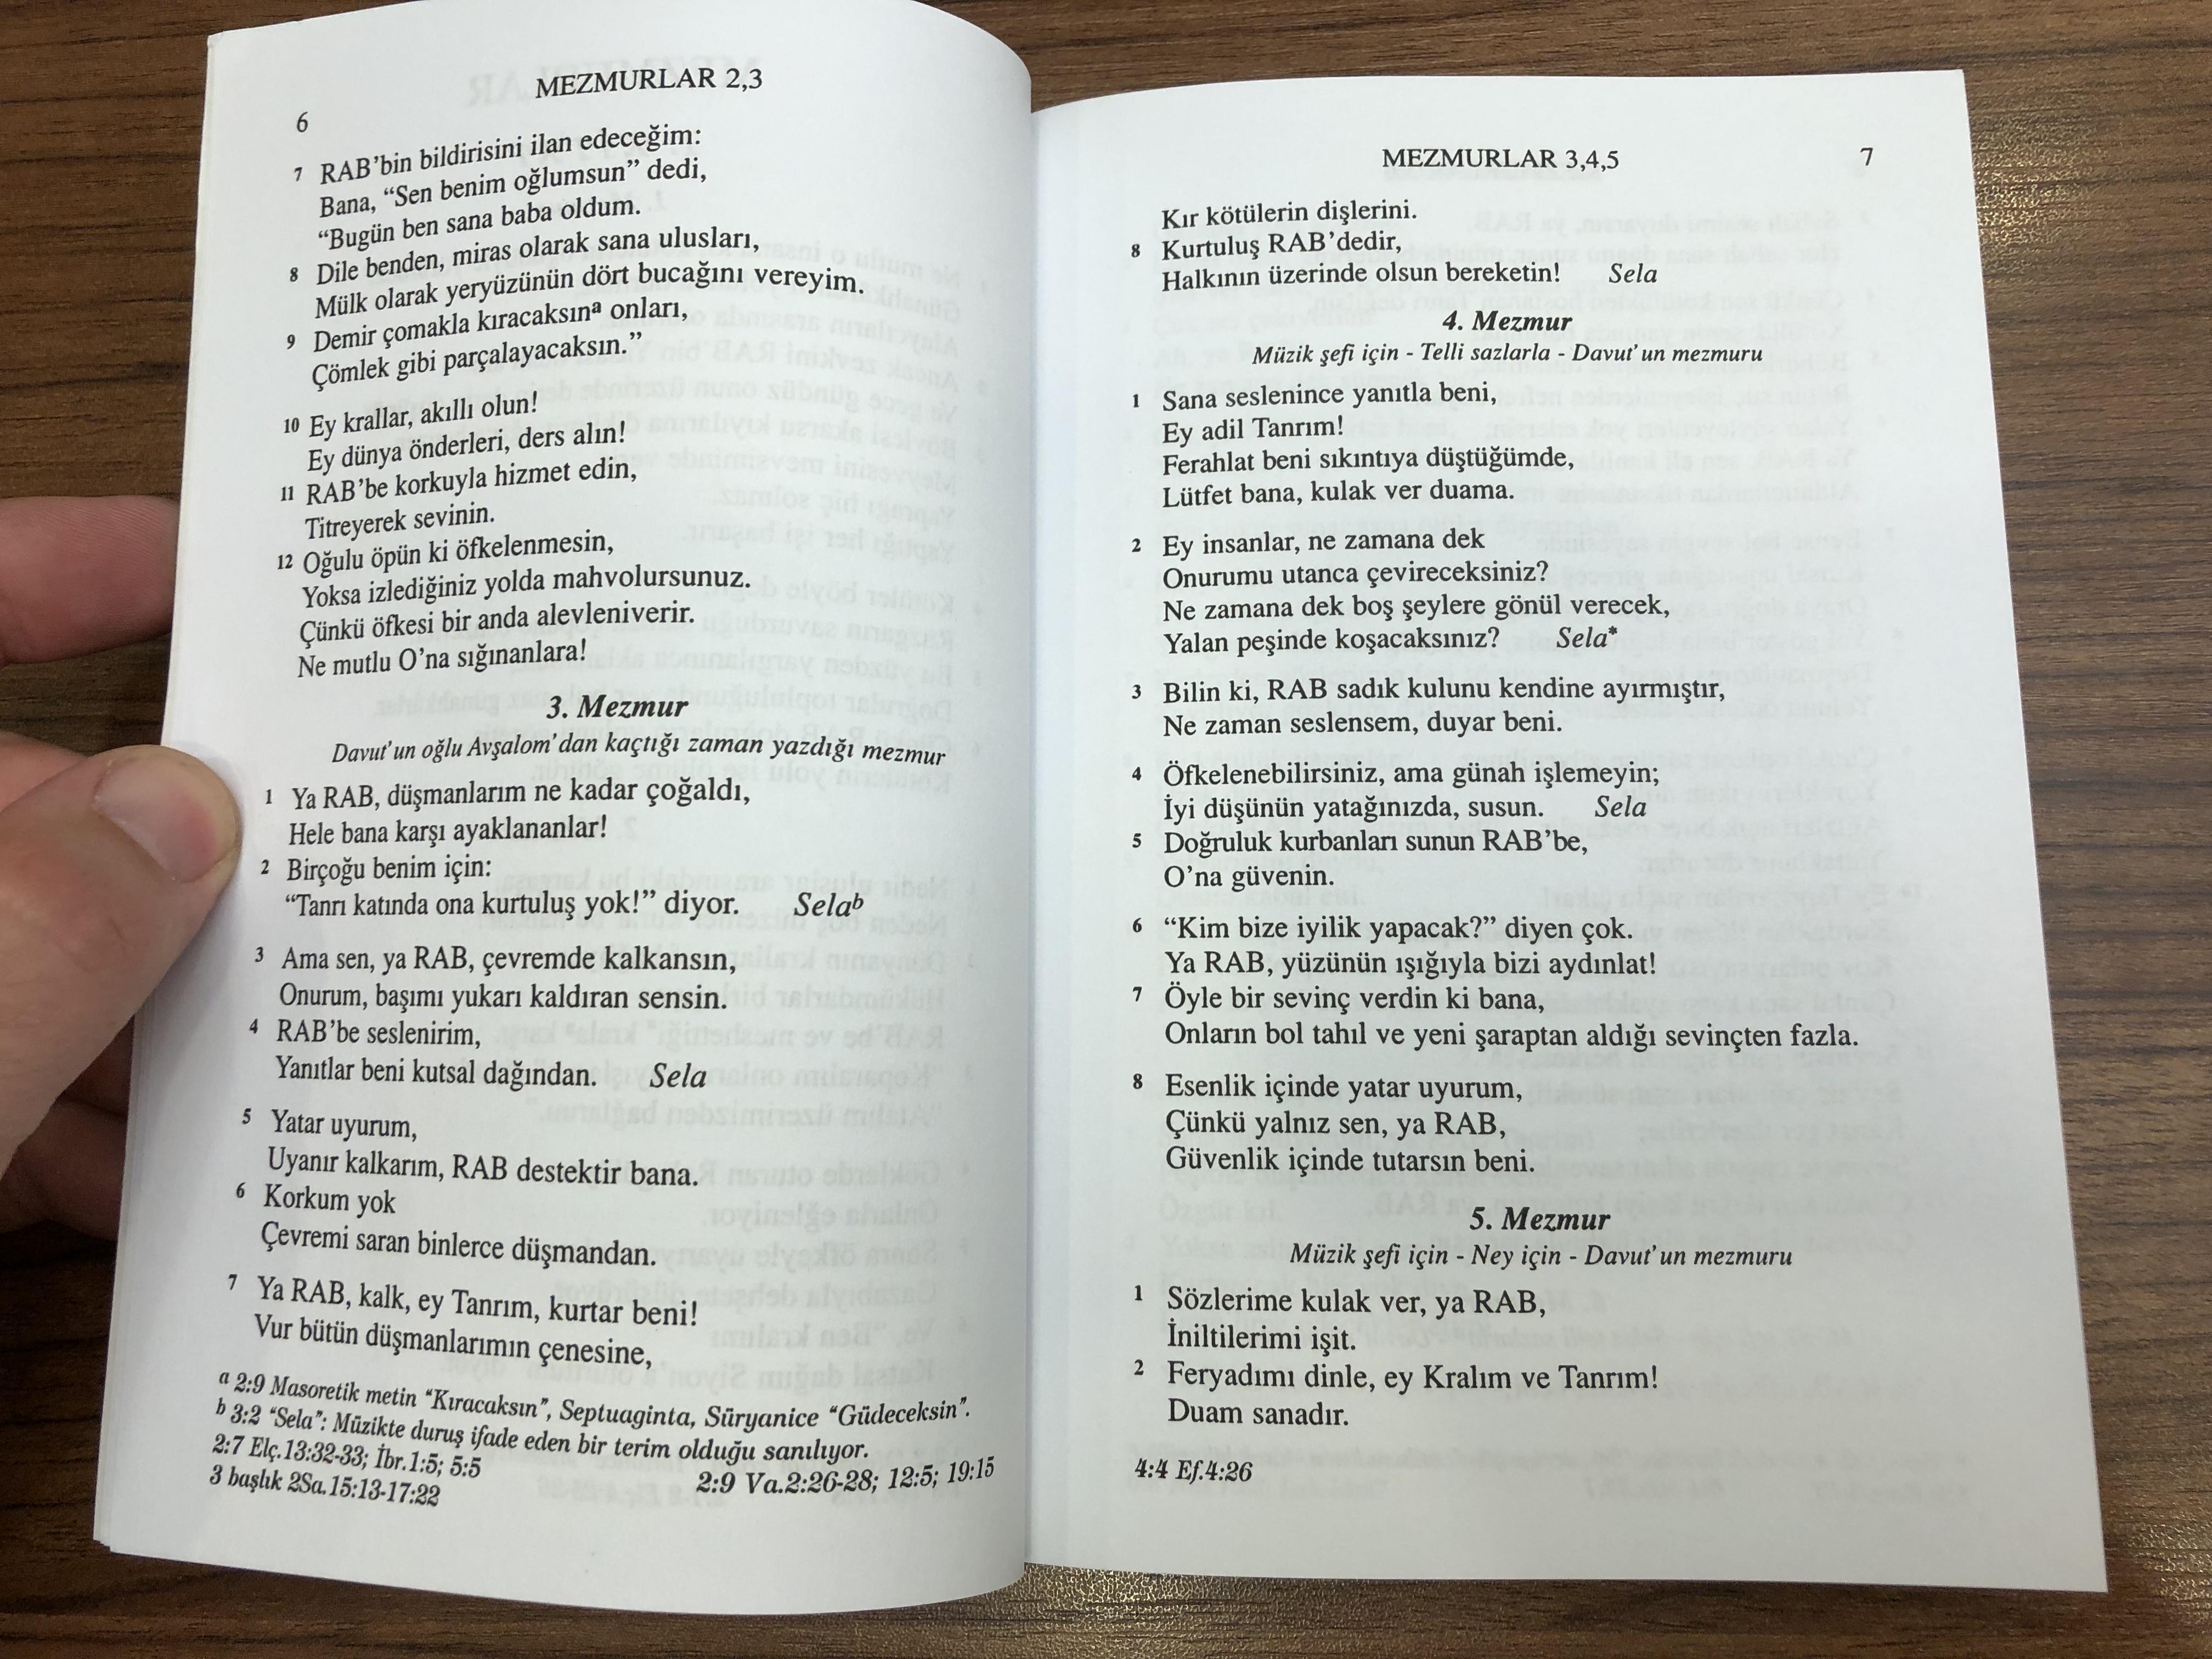 mezmurlar-zebur-zabur-psalms-in-turkish-new-translation-from-the-original-hebrew-language-kitabi-mukaddes-sirketi-paperback-2011-6-.jpg